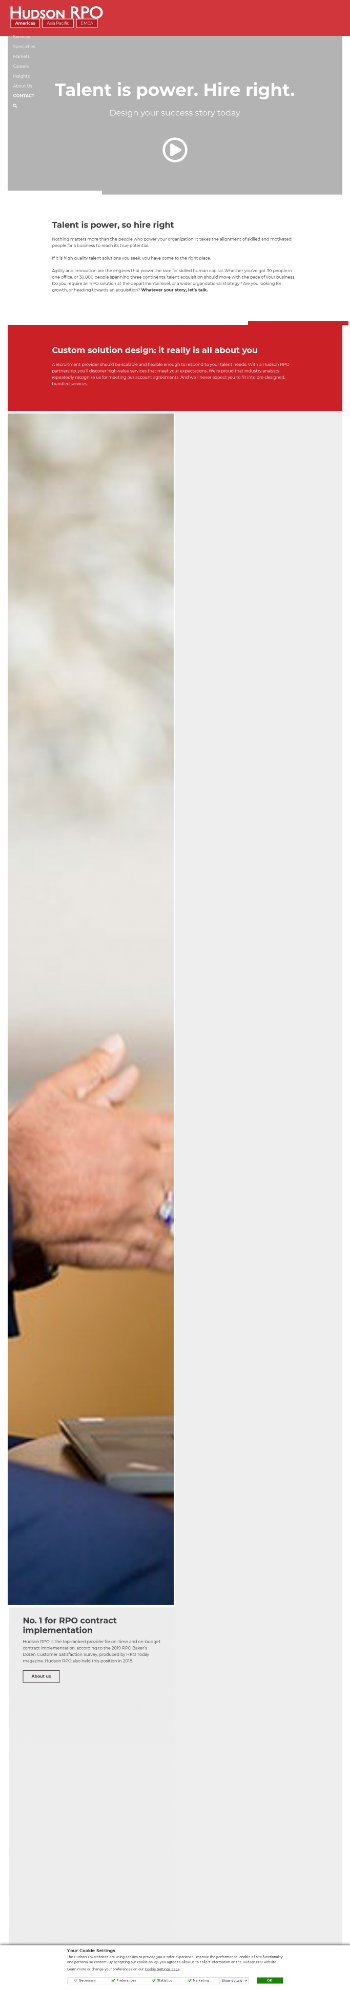 Hudson Global, Inc. Website Screenshot